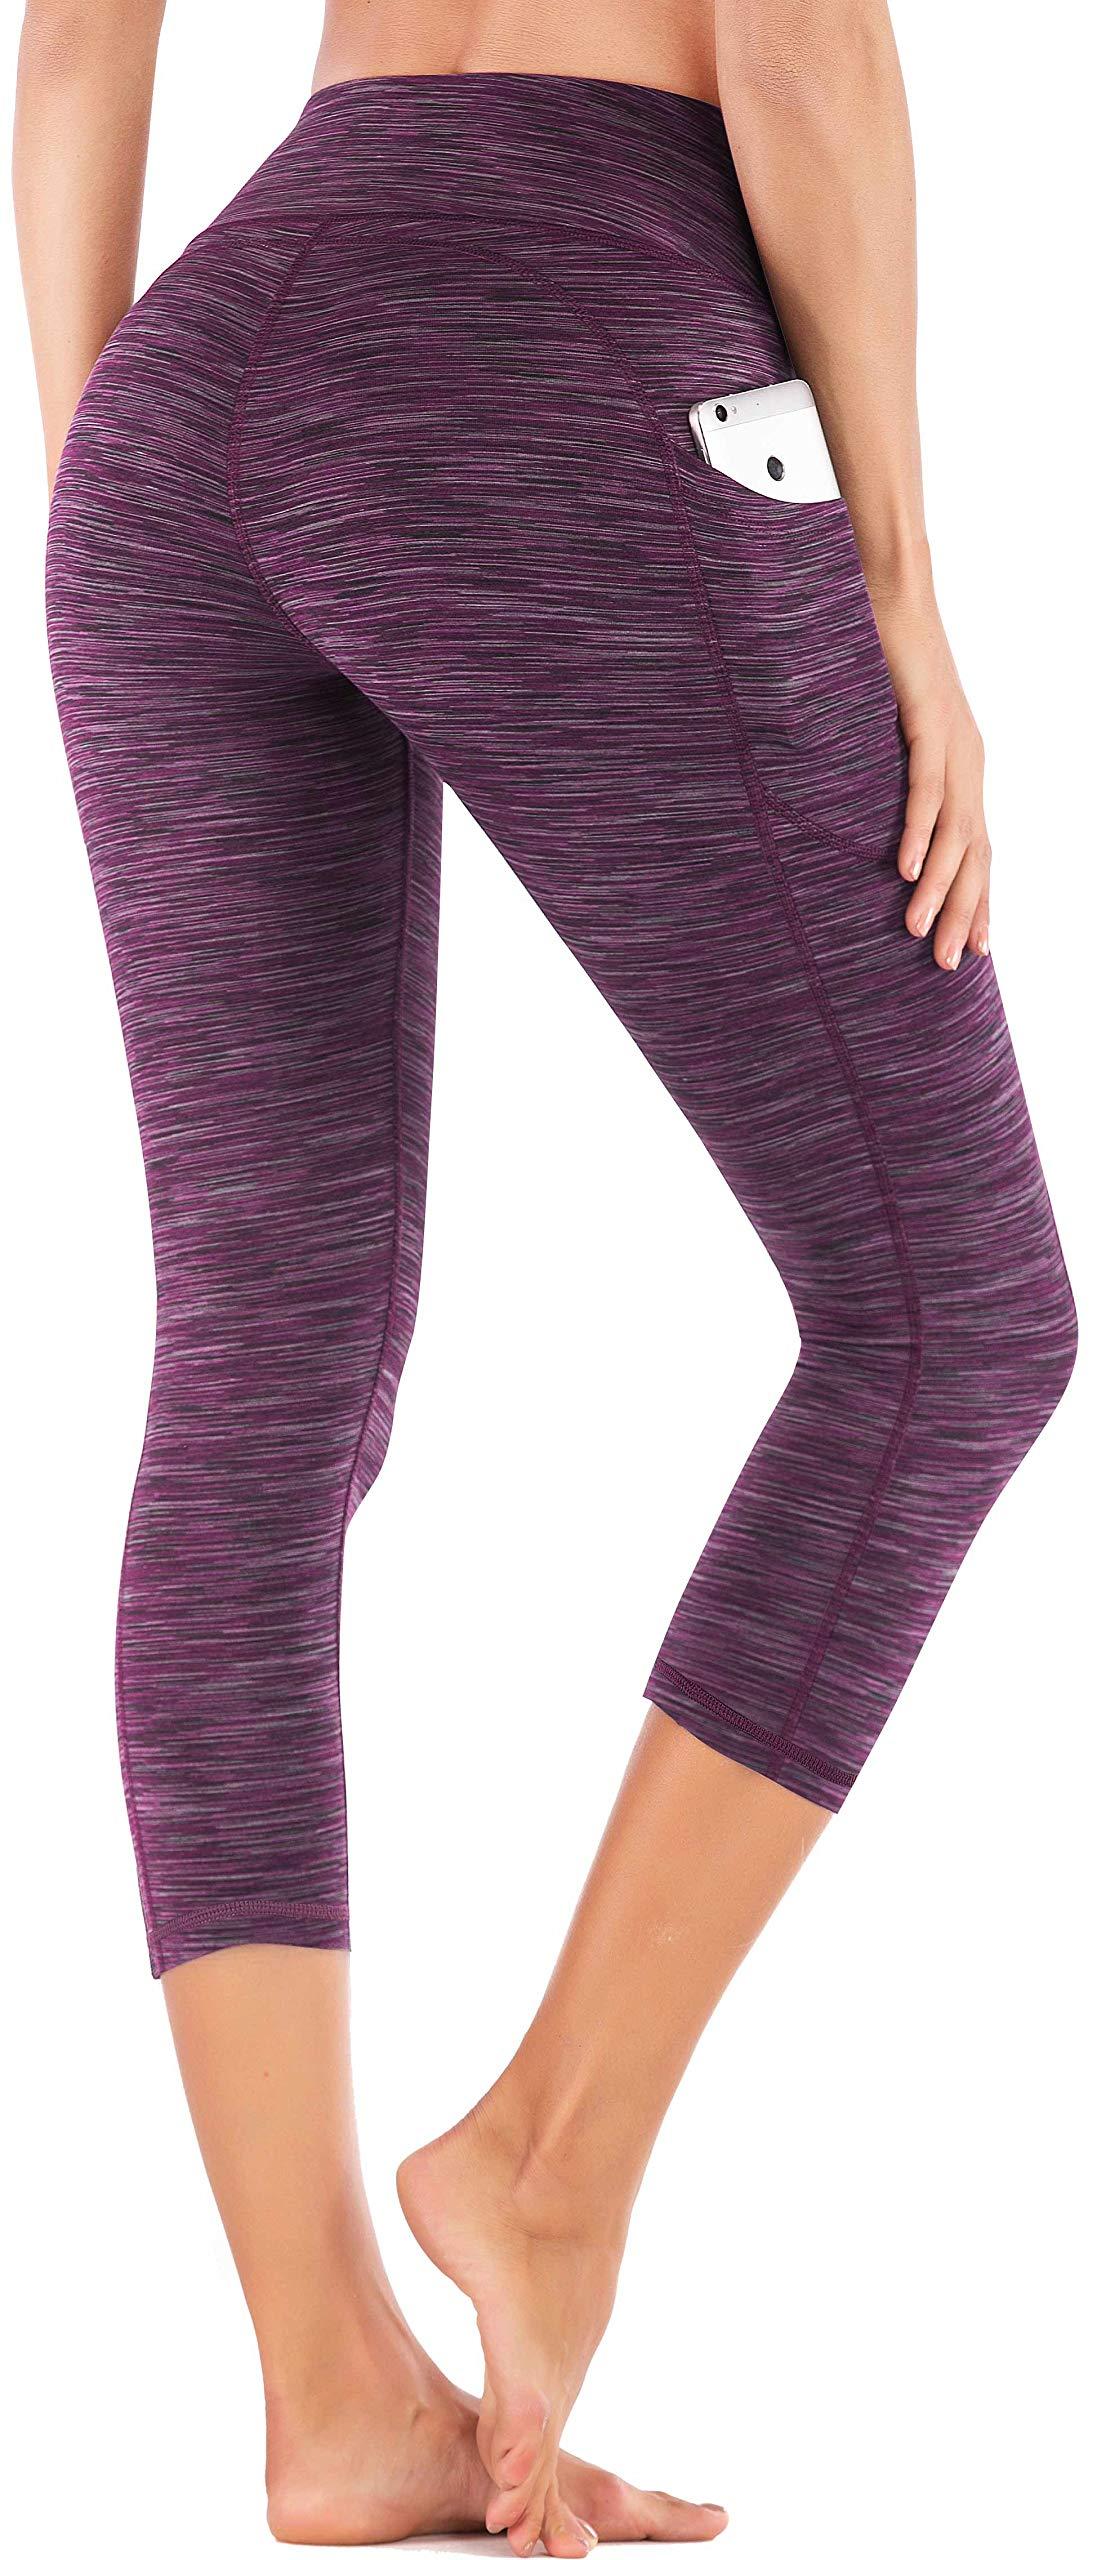 IUGA High Waist Yoga Pants with Pockets, Tummy Control Yoga Capris for Women, 4 Way Stretch Capri Leggings with Pockets(Space Dye Purple, XS) by IUGA